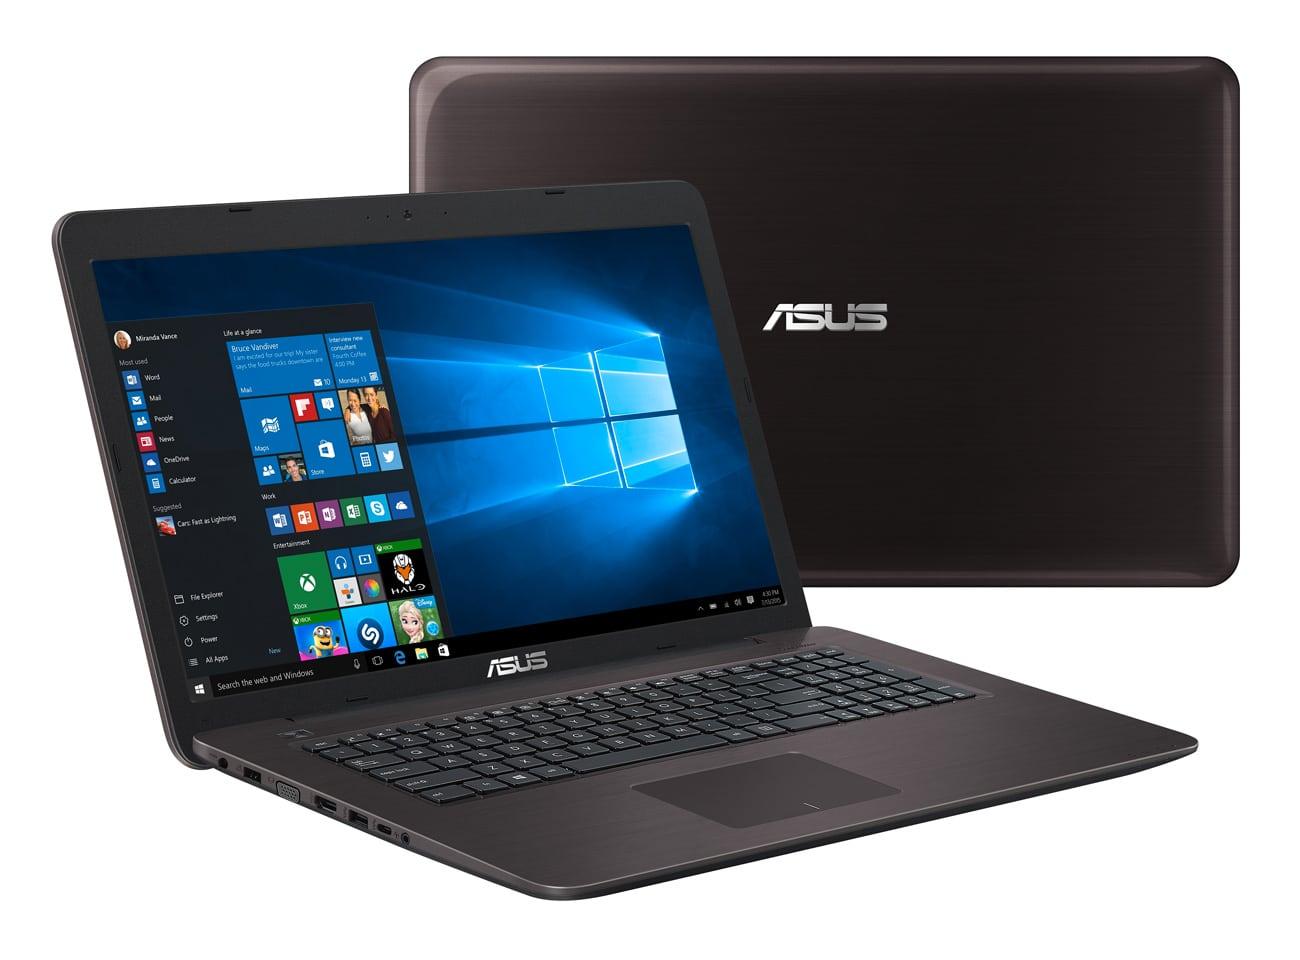 Asus K756UQ-TY260T promo 771€, PC portable 17 pouces Kaby i7 940MX 8 Go